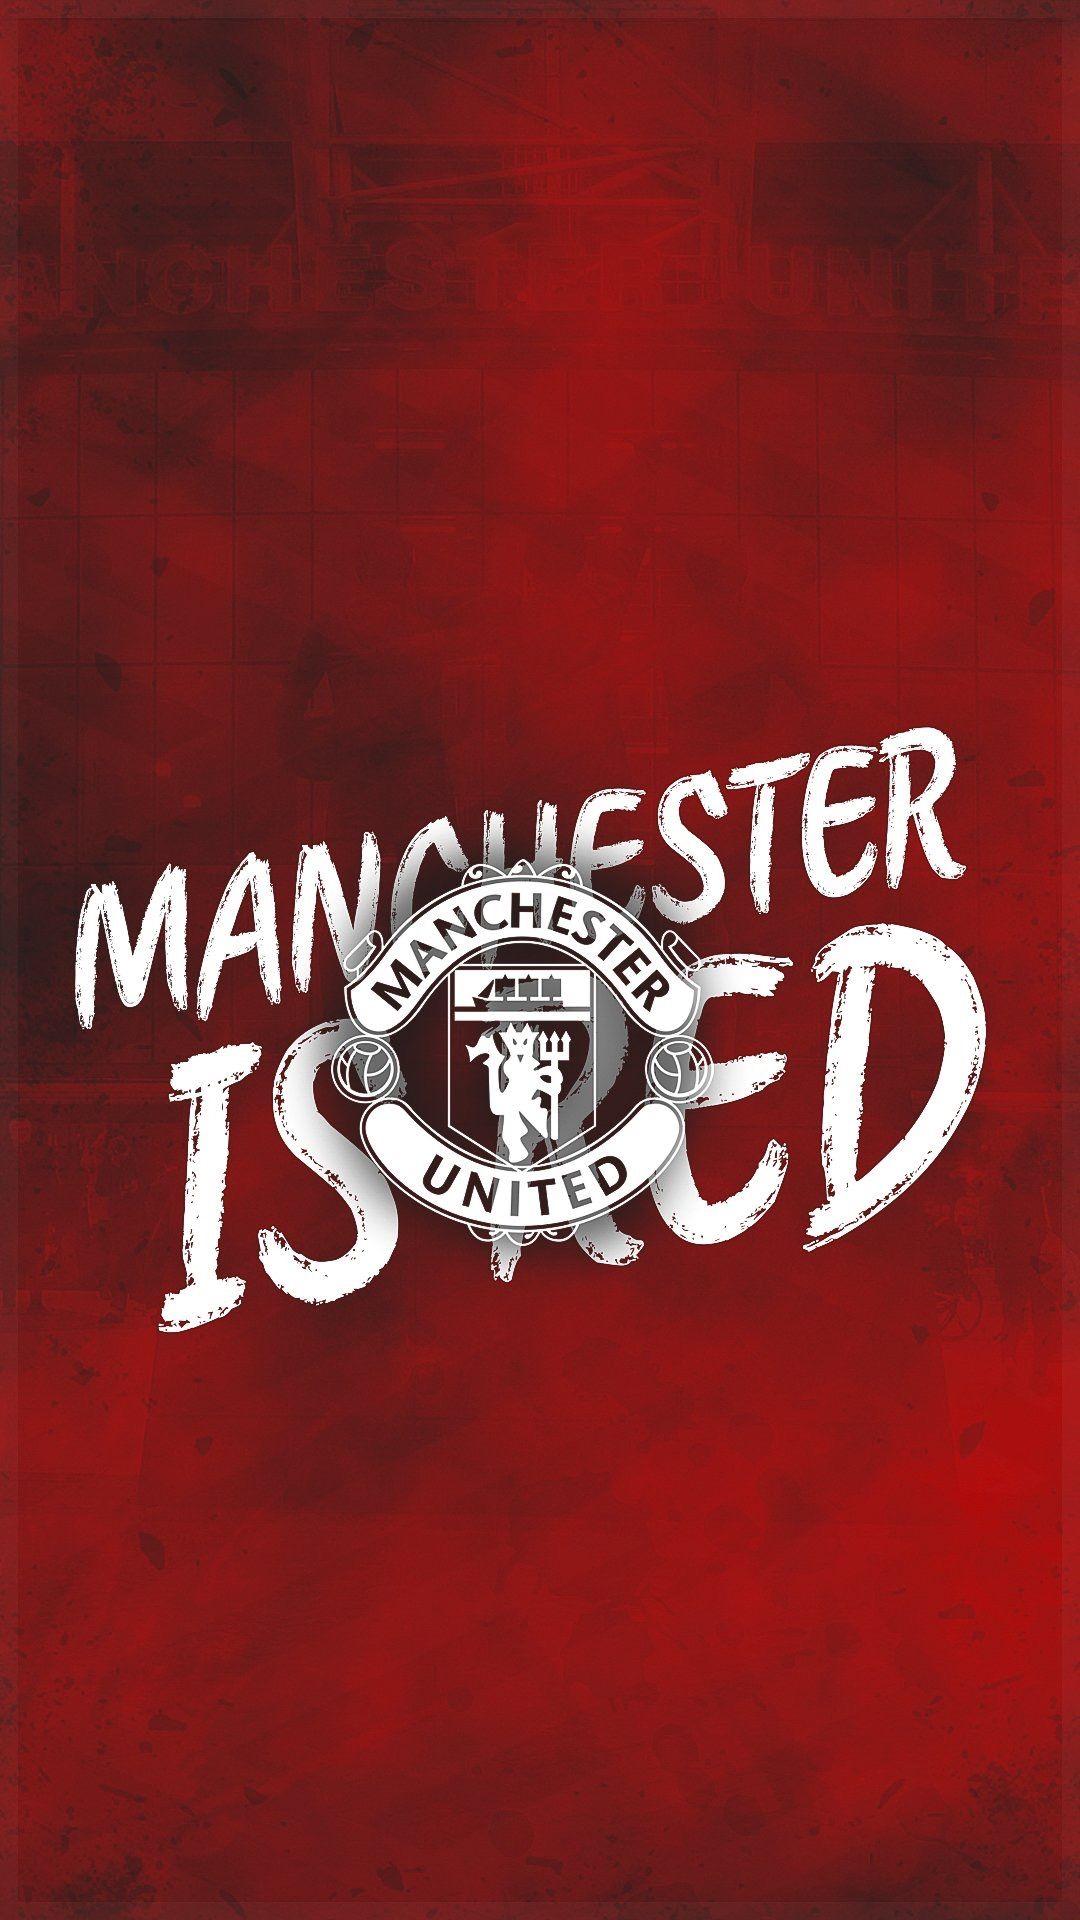 Pin oleh Wiwit Punto di Manchester Bola kaki, Gambar